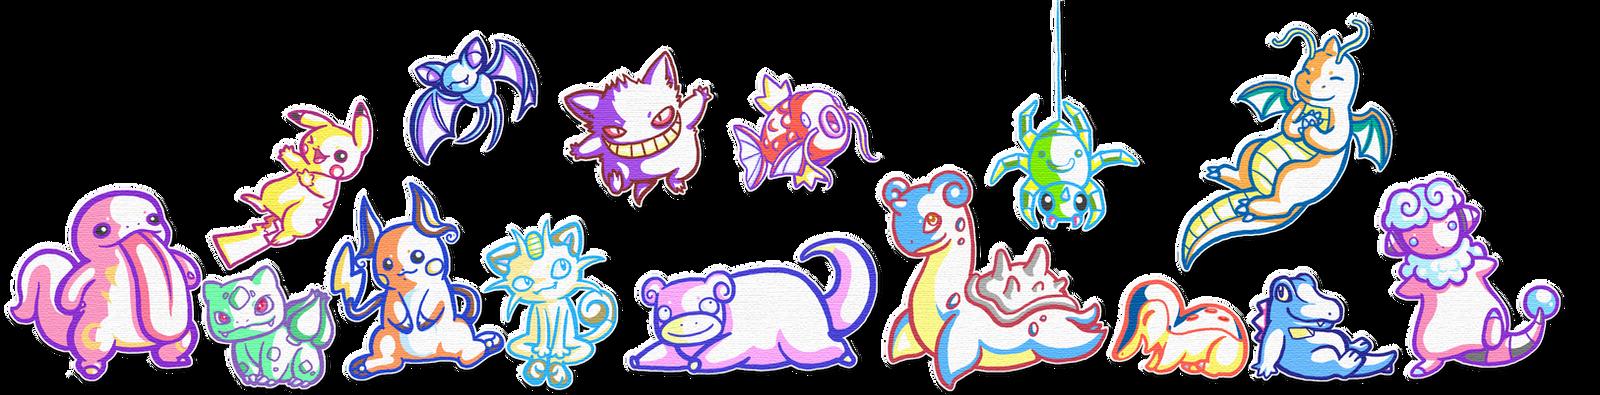 Pokemon- Sticker style by BakaMichi